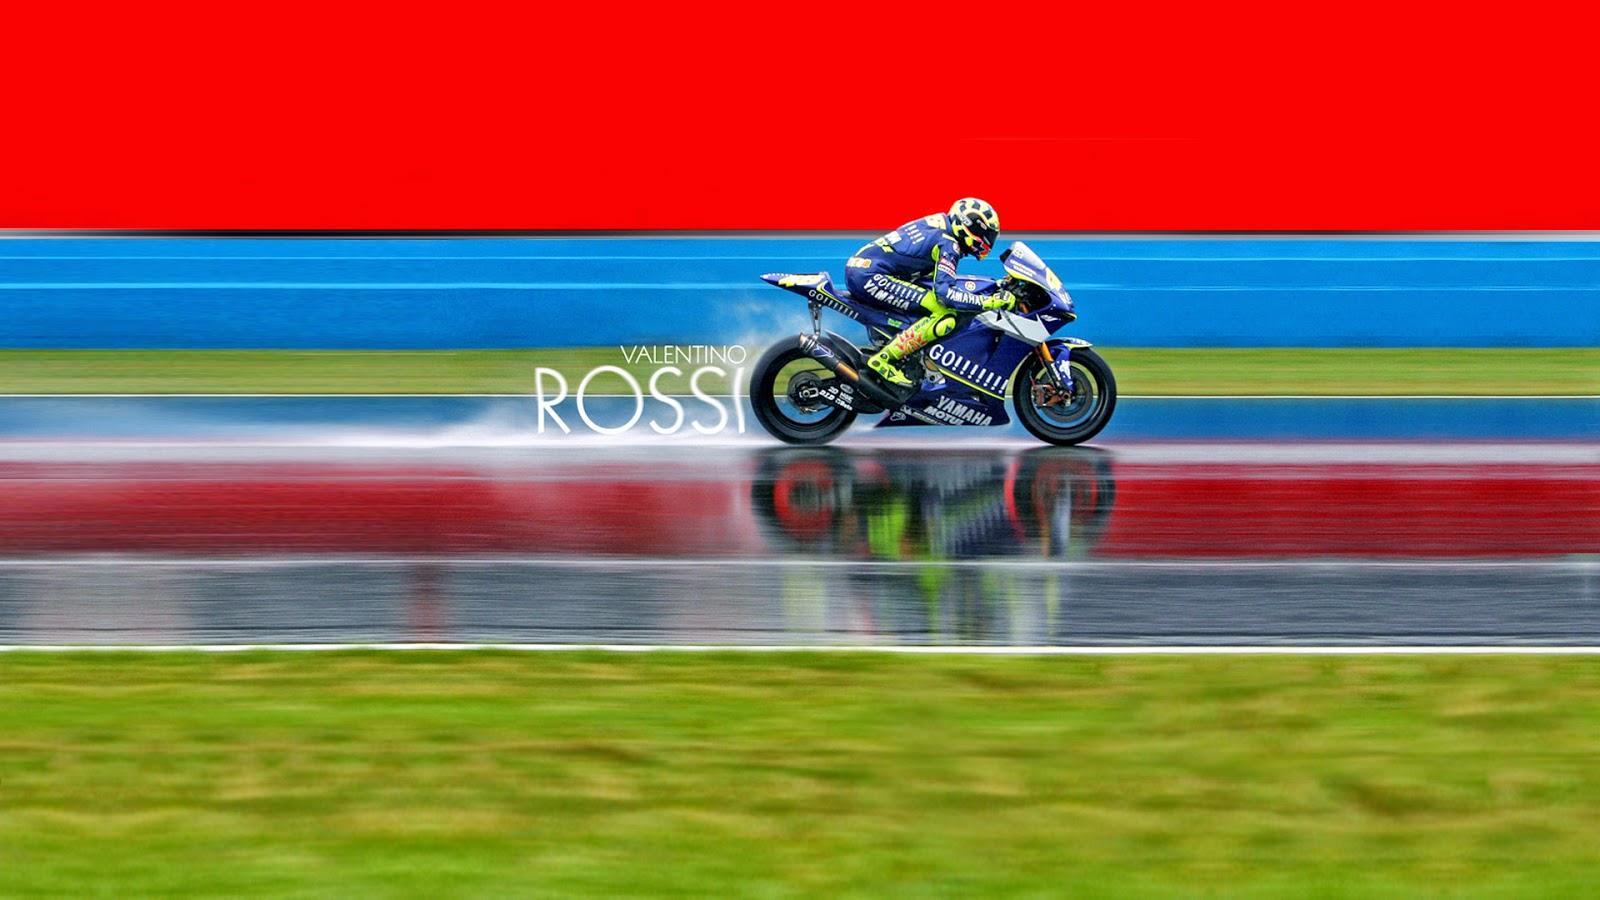 Valentino Rossi MotoGP Racer 2015